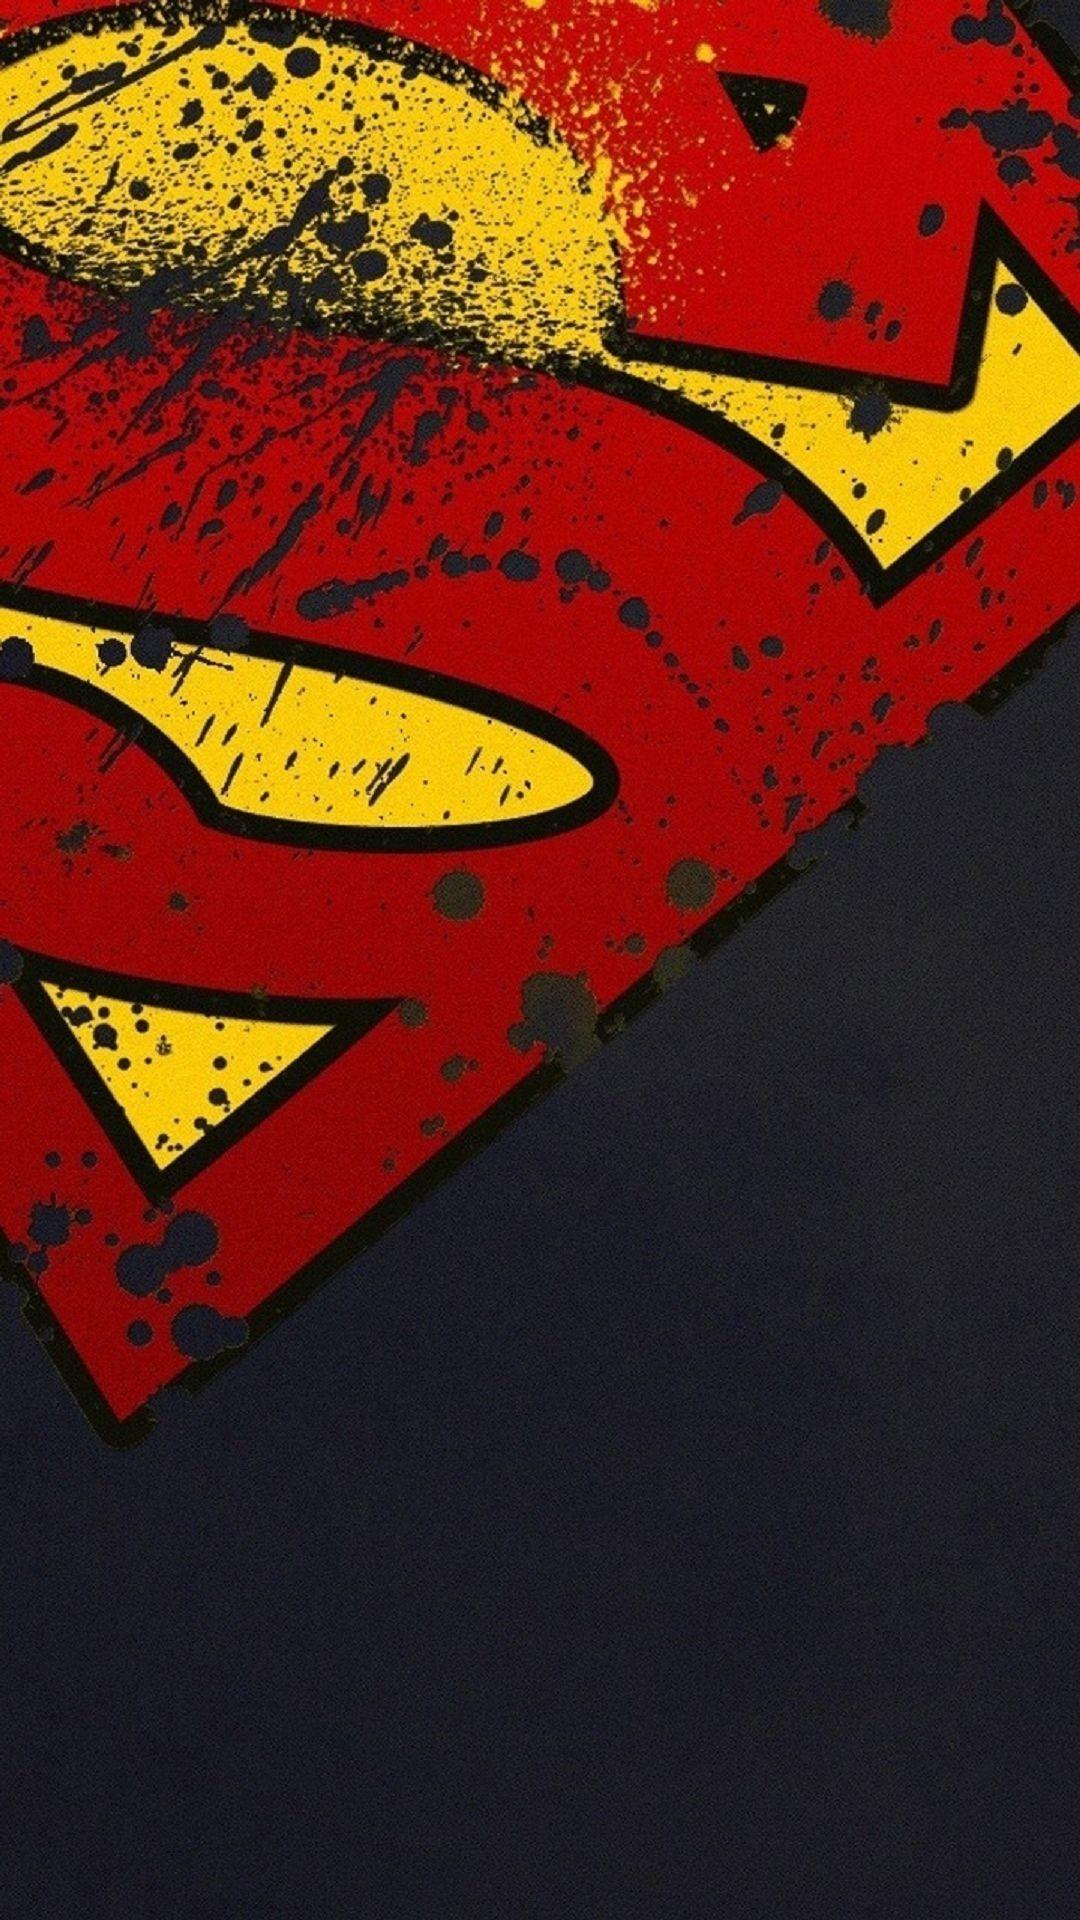 Superman Logo Minimal iPhone 6 Plus HD Wallpaper …